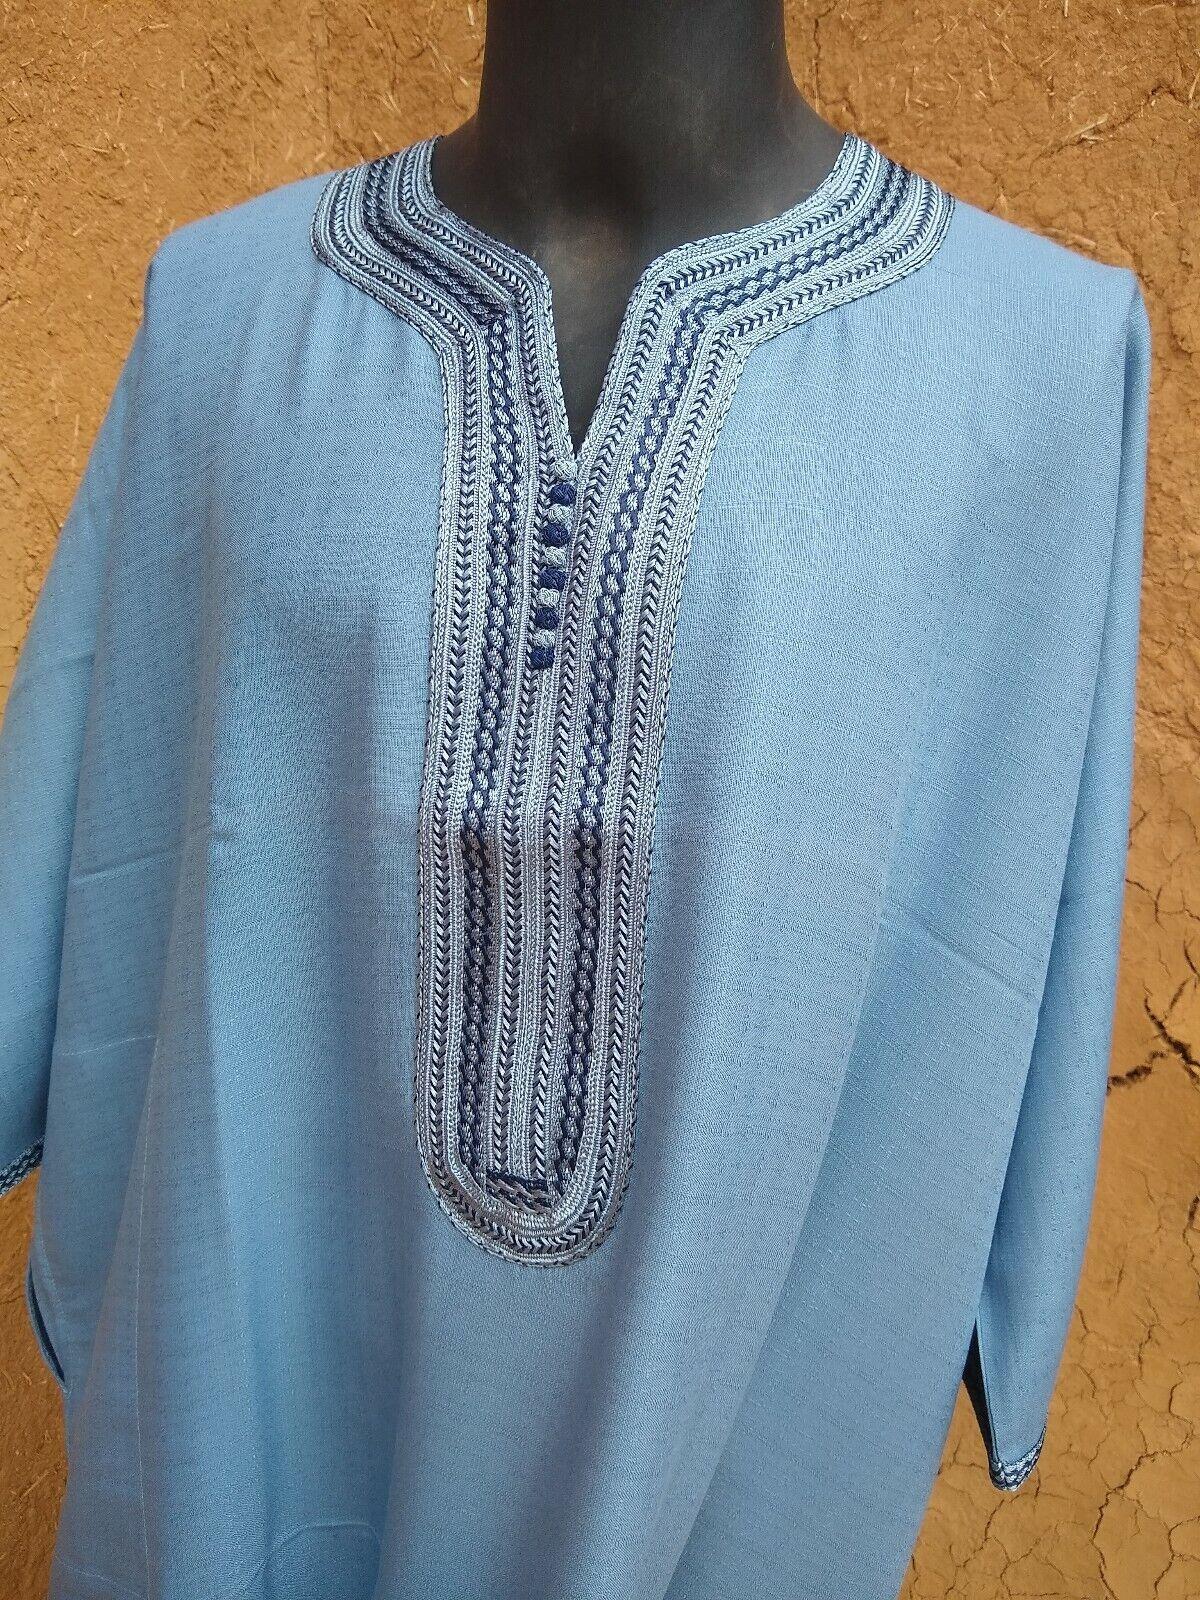 Luxury 2 Pack Moroccan Thobe Jilbab Gandora Djellaba MIX/MATCH RANGE 57